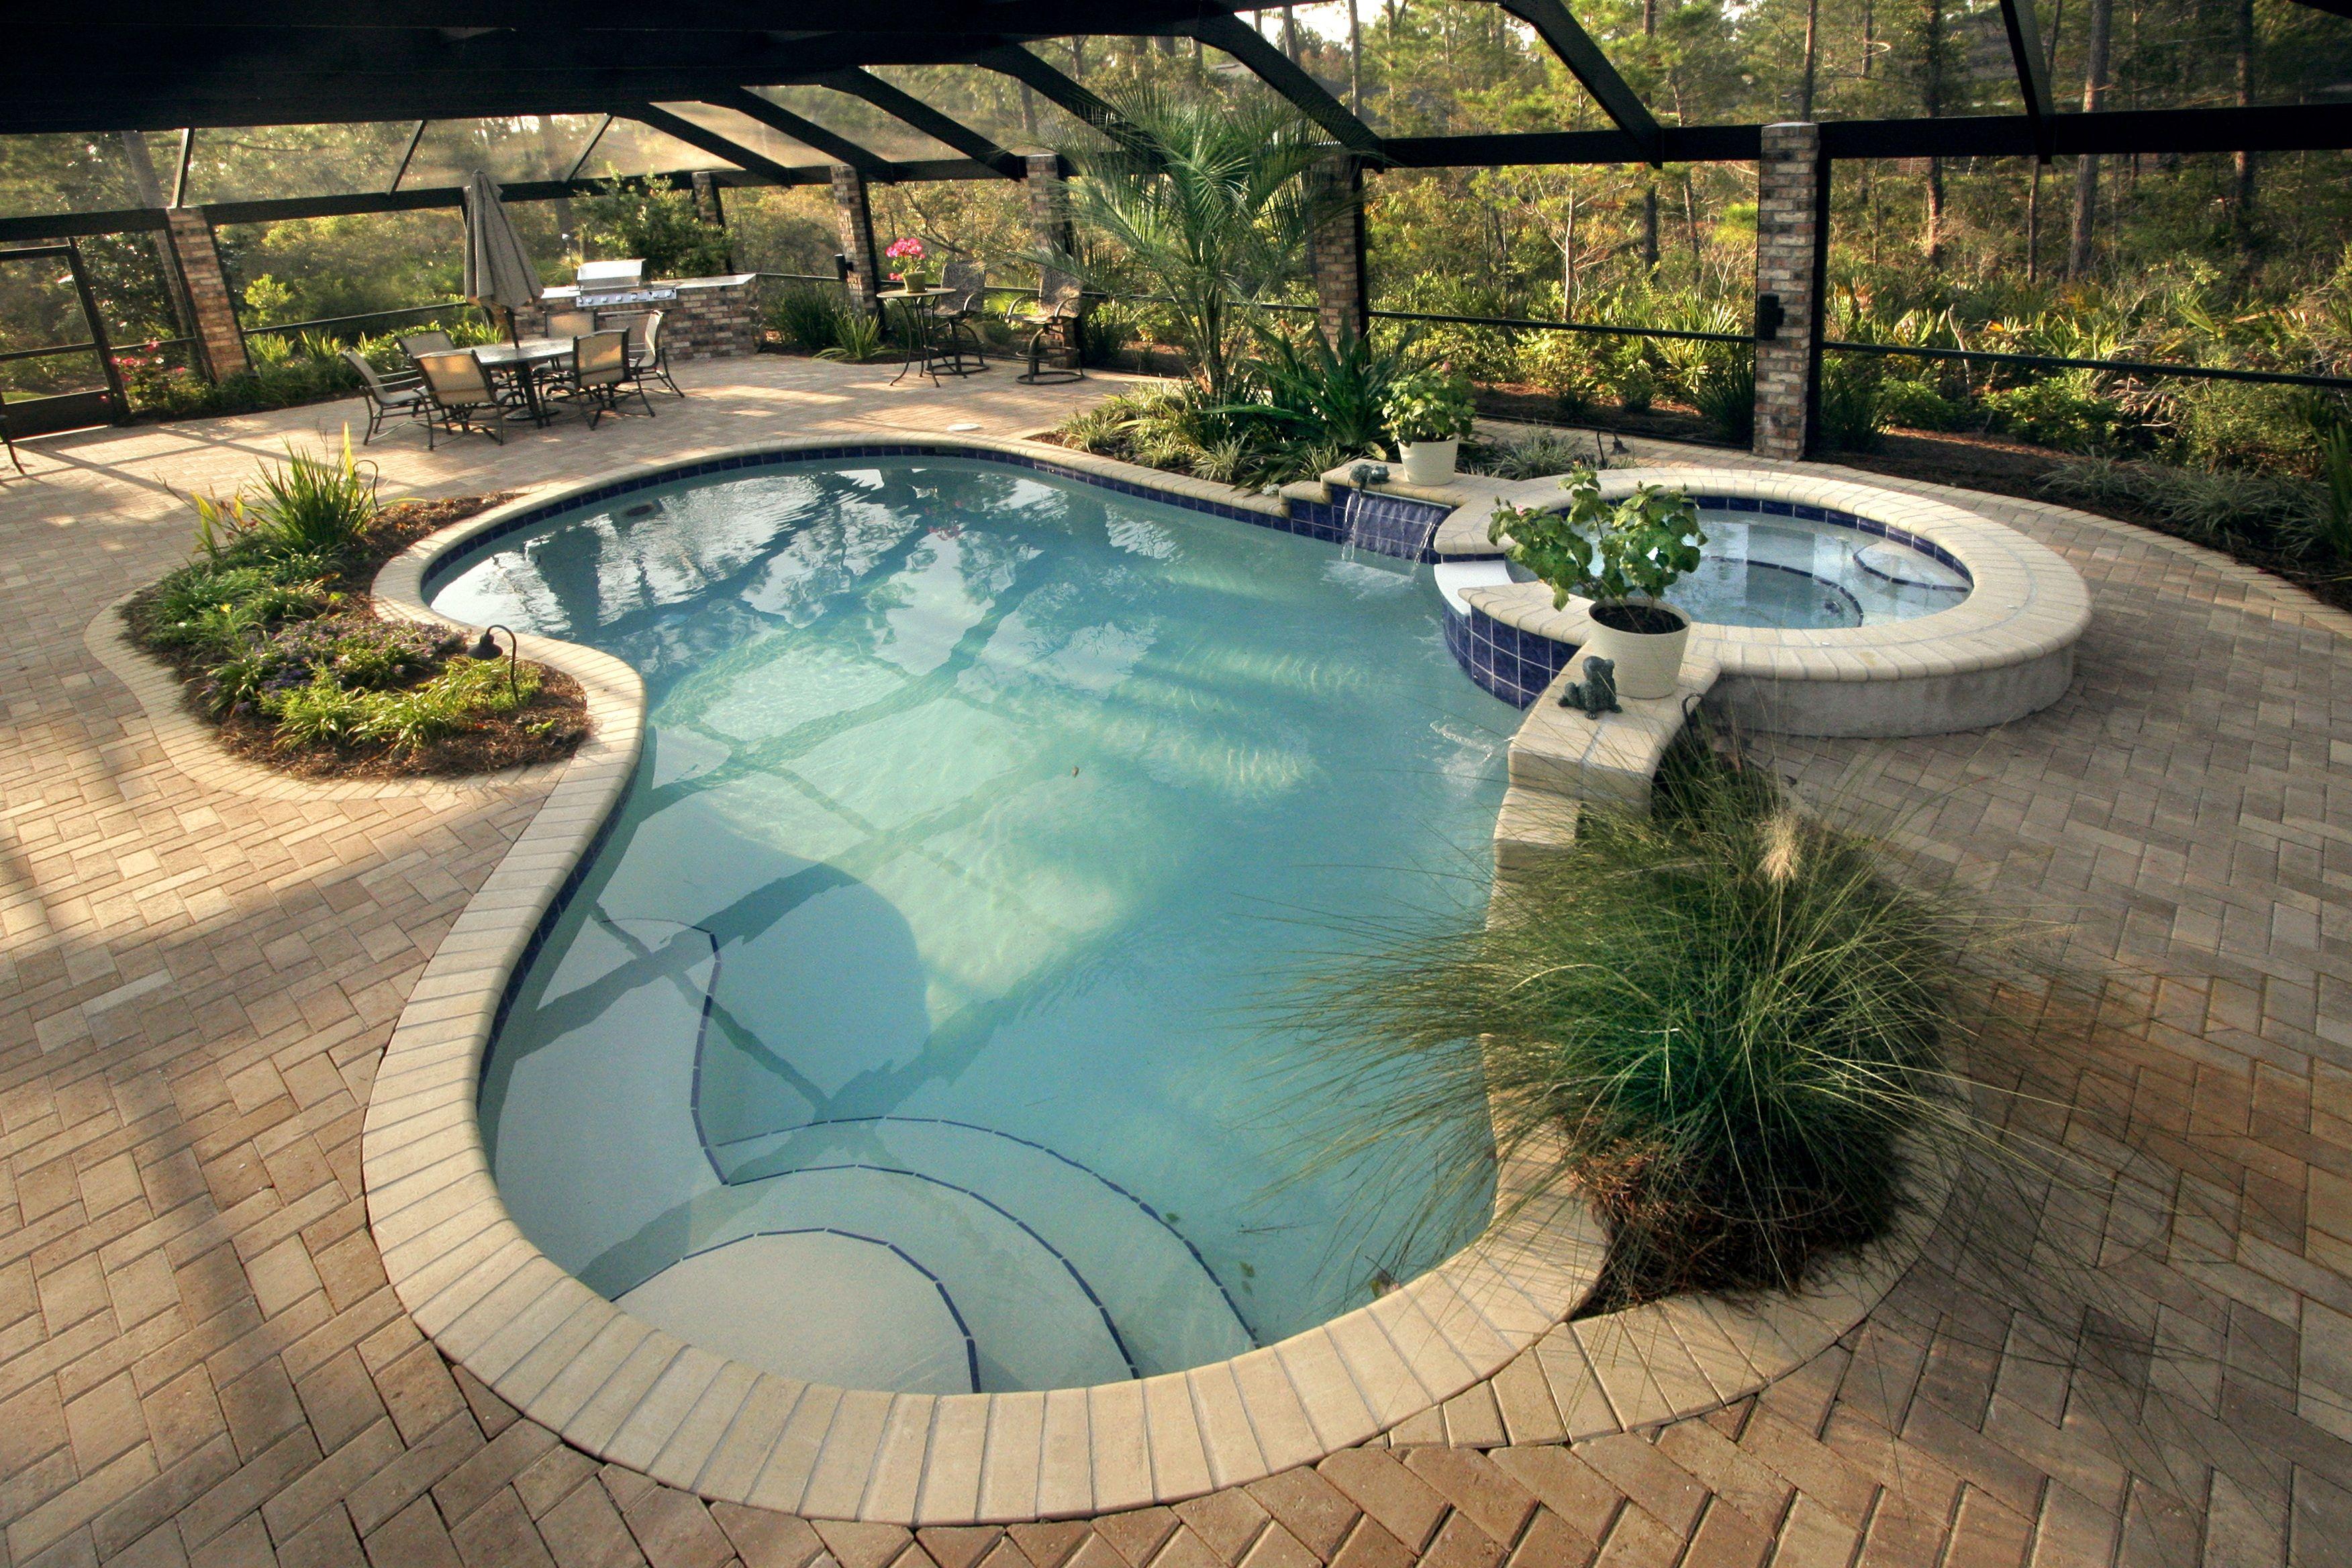 Swimmingpool Luxurydesign Construction Poolcost Www Technologypools Co Uk Small Pool Design Small Backyard Pools Backyard Pool Designs